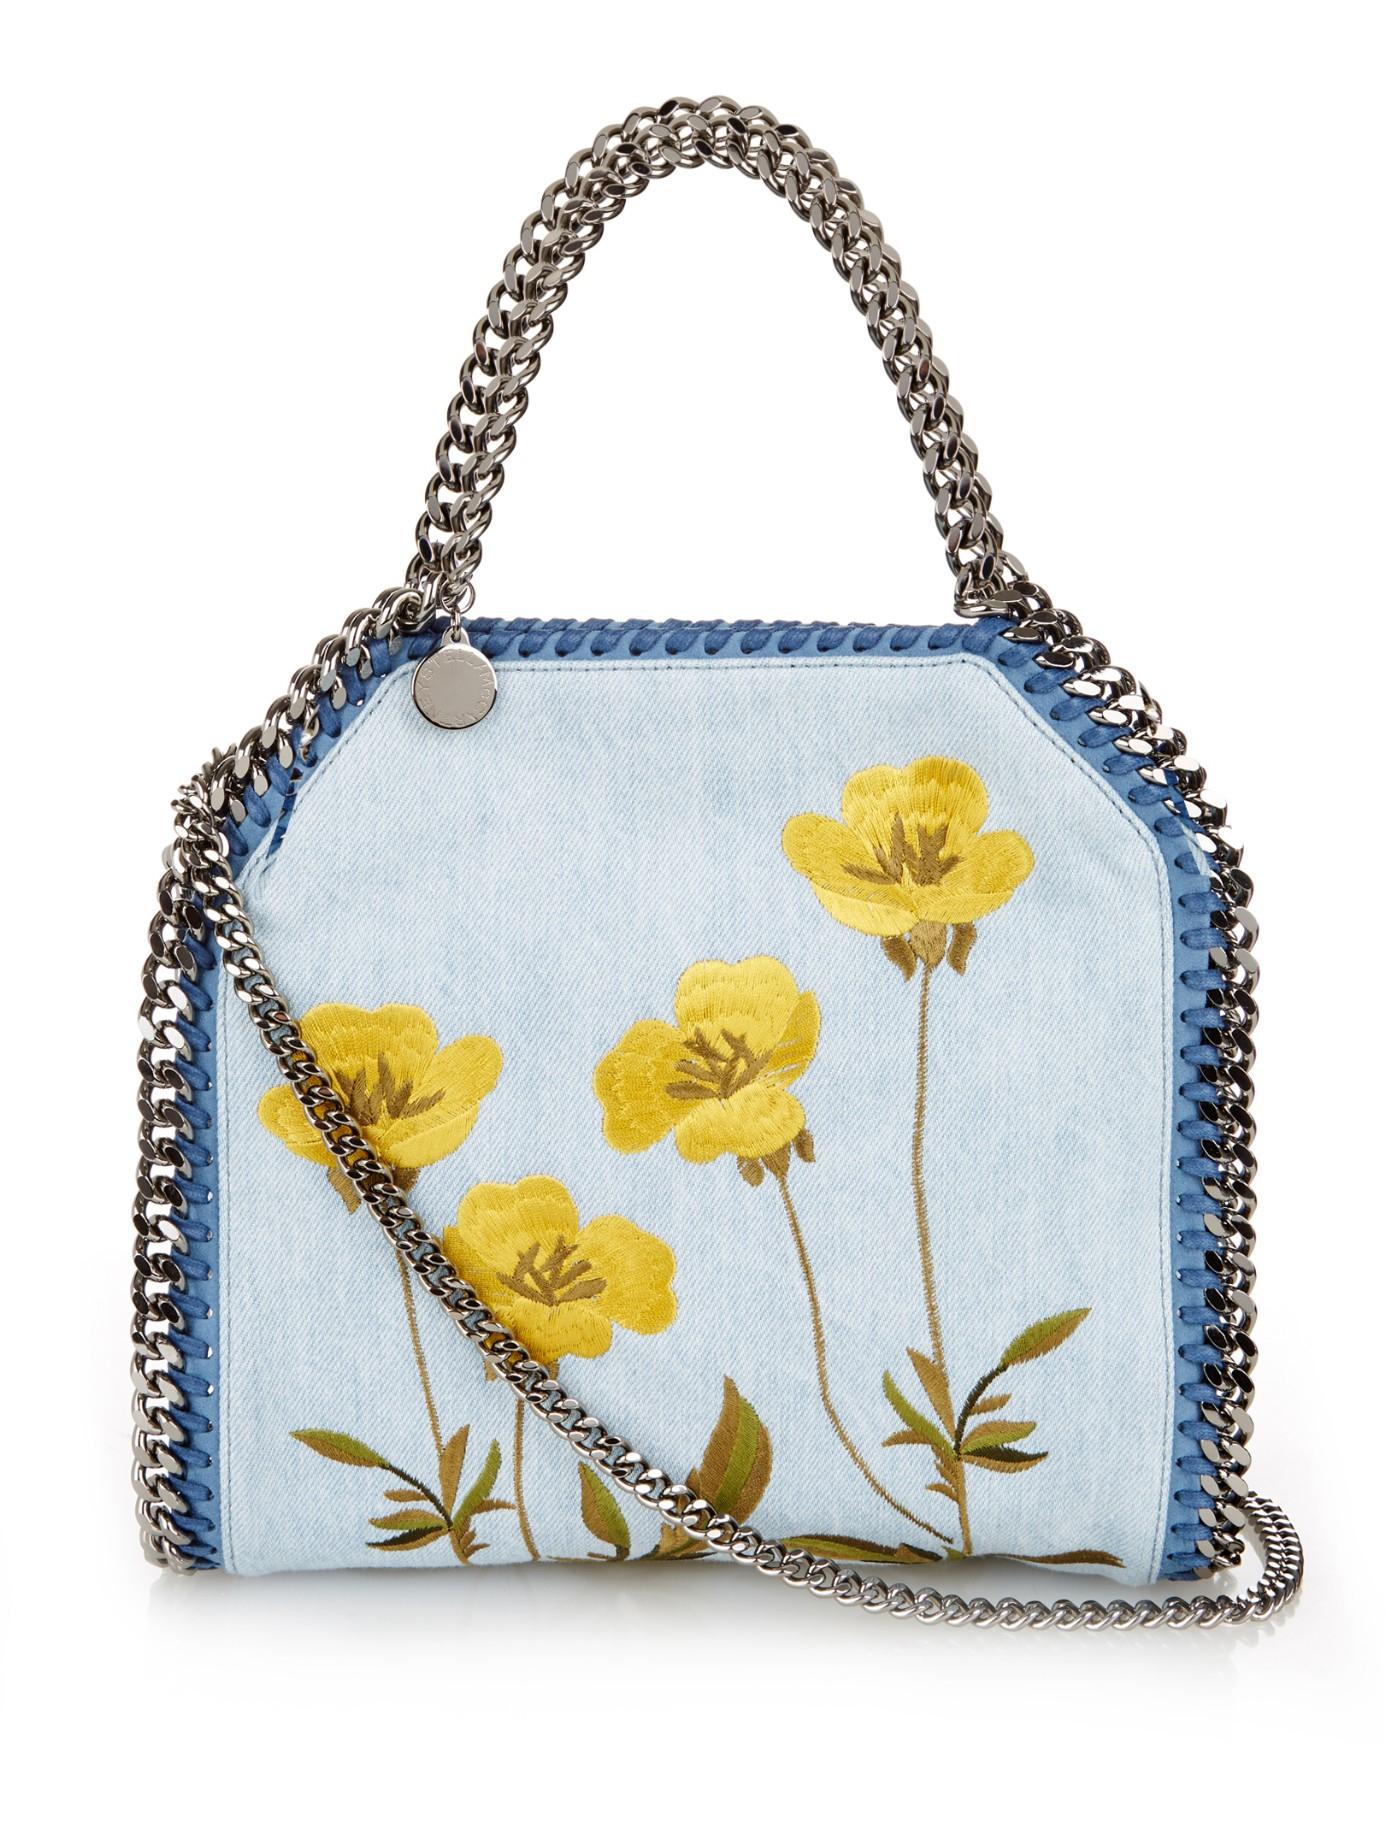 aea4ade5434e Lyst - Stella McCartney Falabella Mini Bella Denim Cross-body Bag in ...